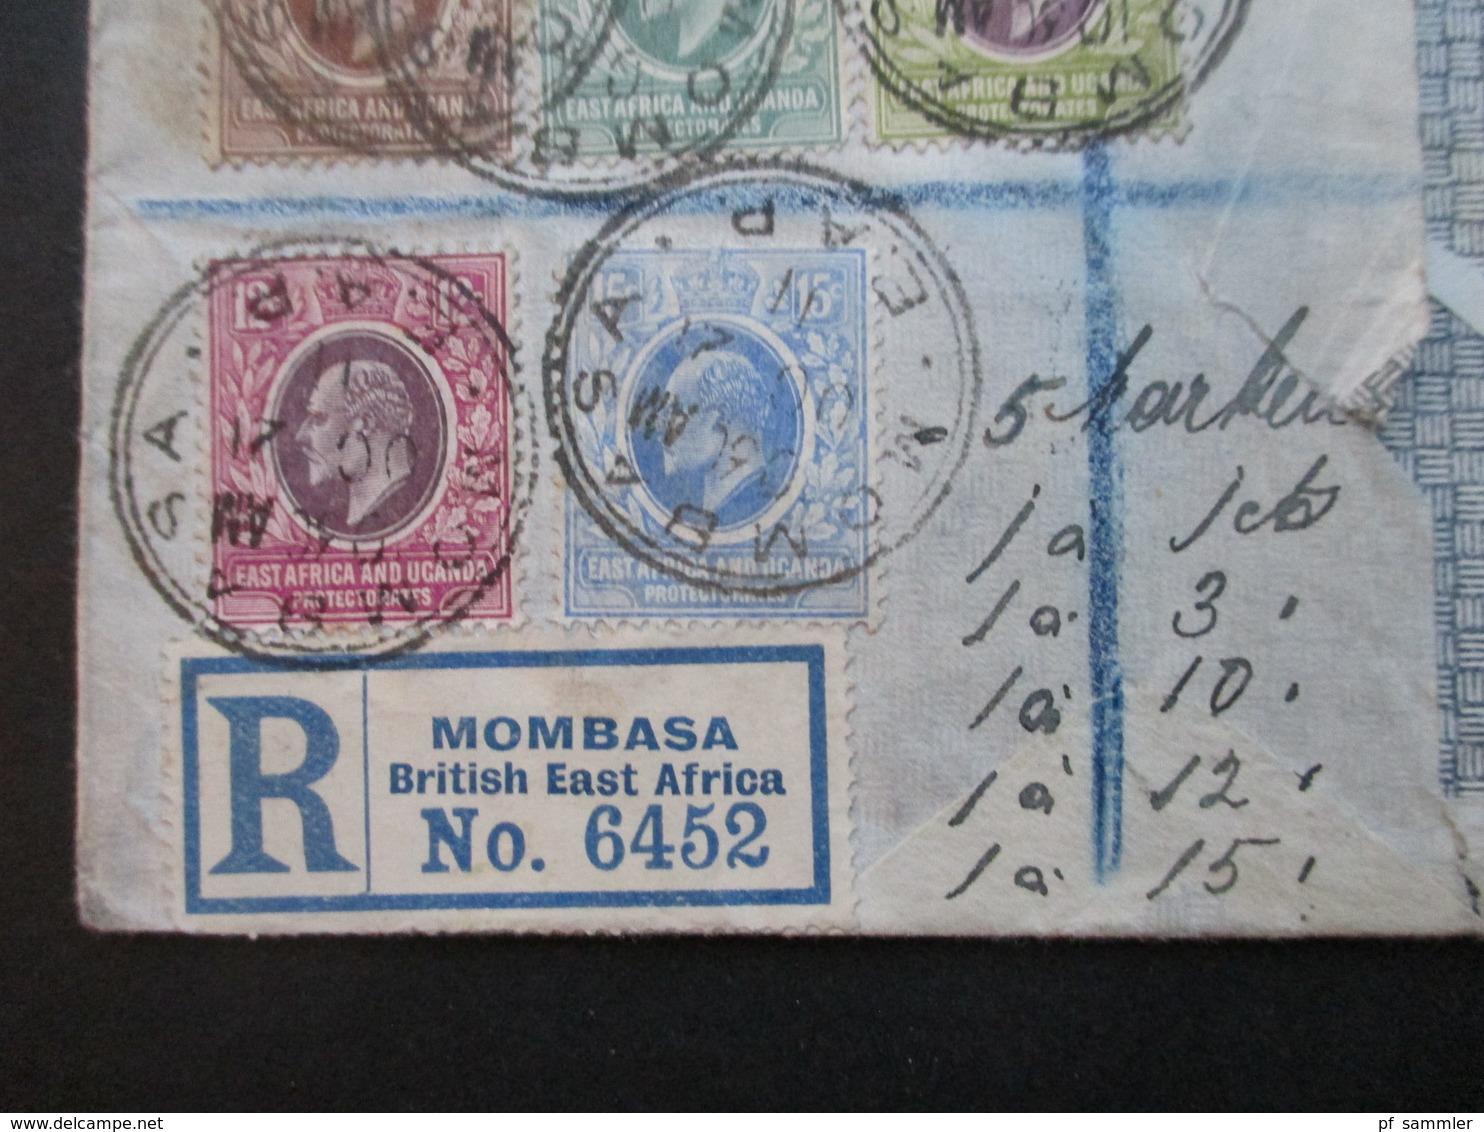 GB Kolonie Uganda Beleg Mit 5 Marken Stempel Mombasa Registered Mail Mombasa British East Africa Per SS Prinzregent Luit - Protettorati De Africa Orientale E Uganda